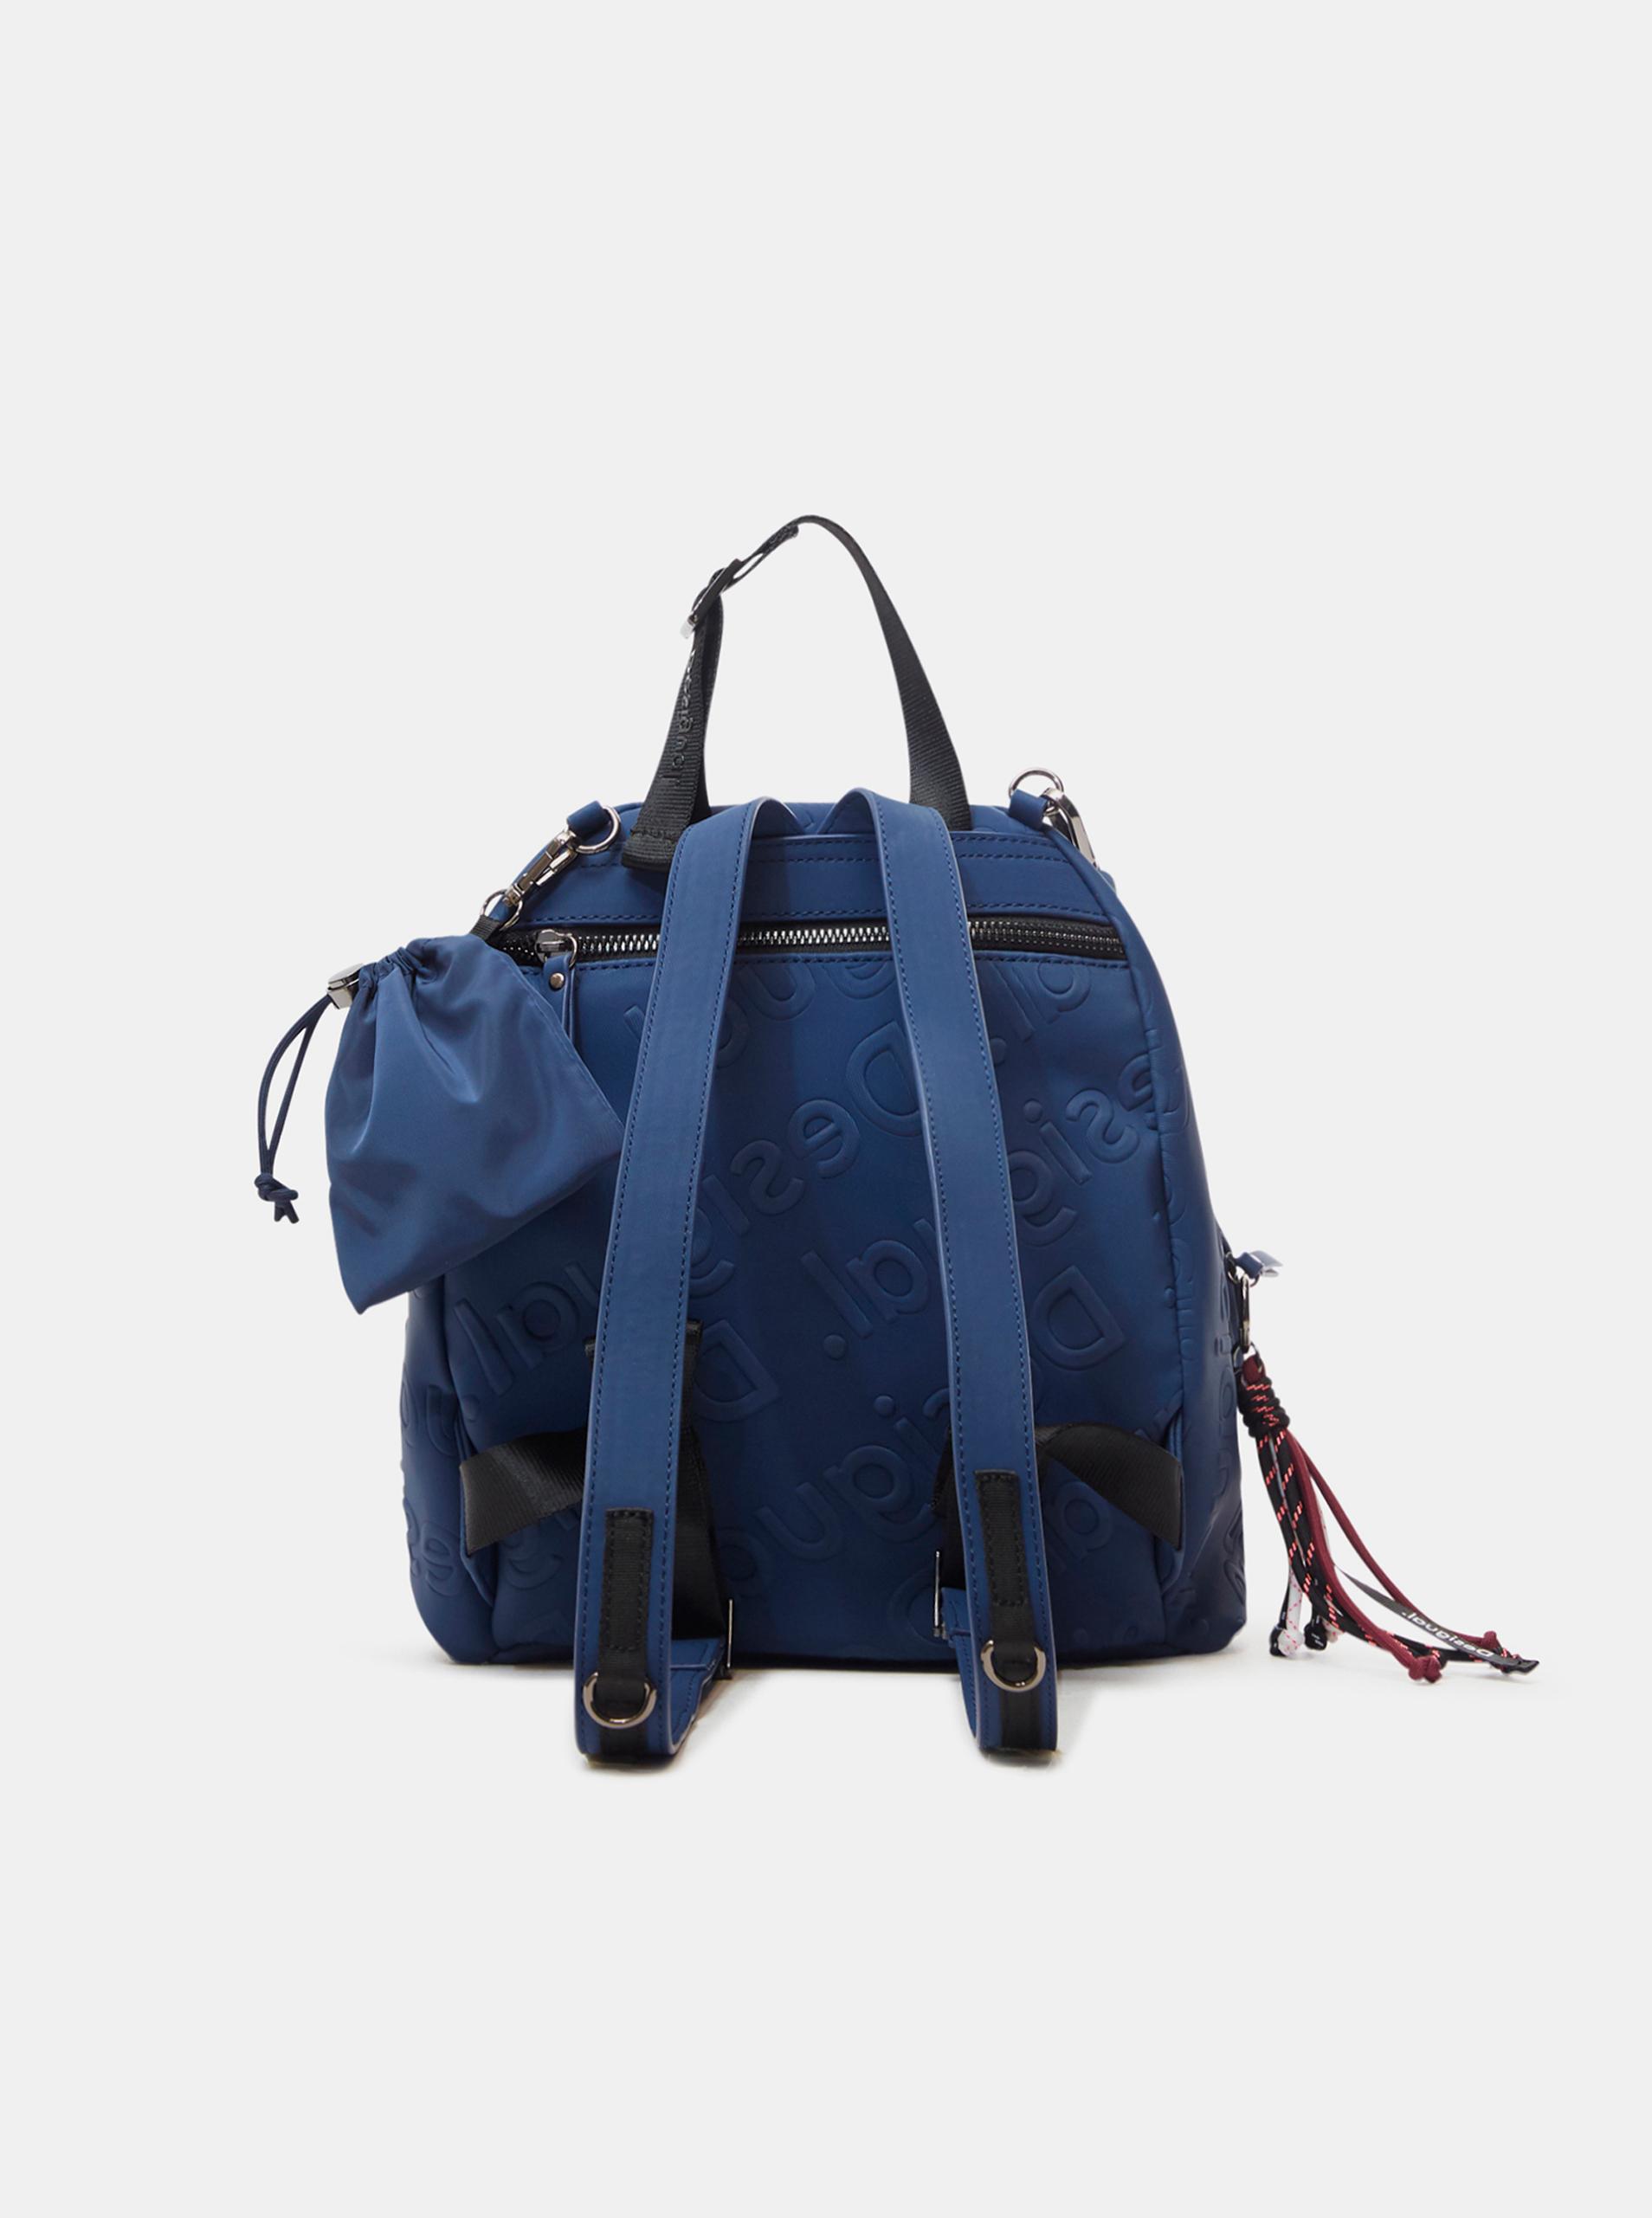 Desigual Women's backpack blue  Galia